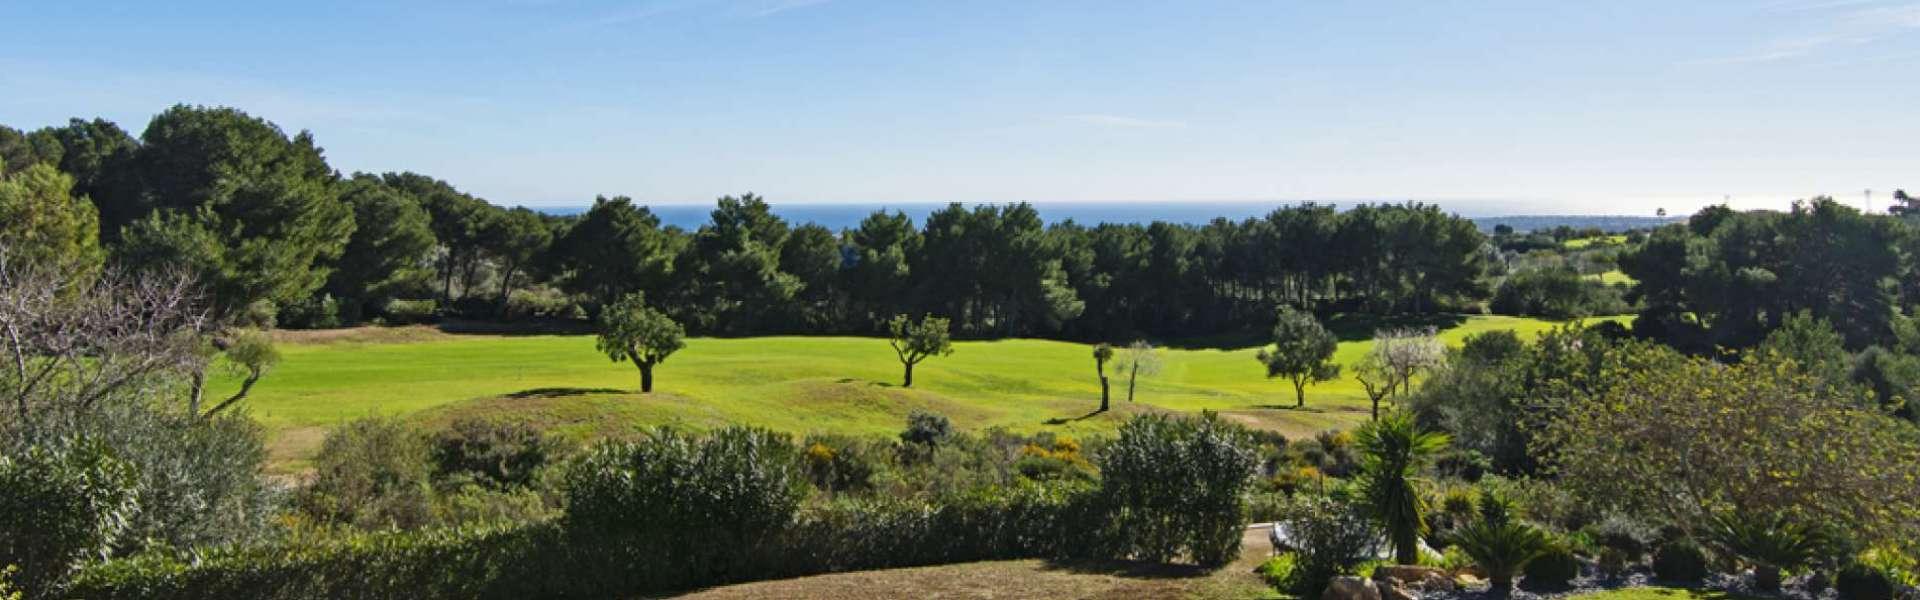 Porto Colom - Finca mit schönem Blick in Vall D'Or